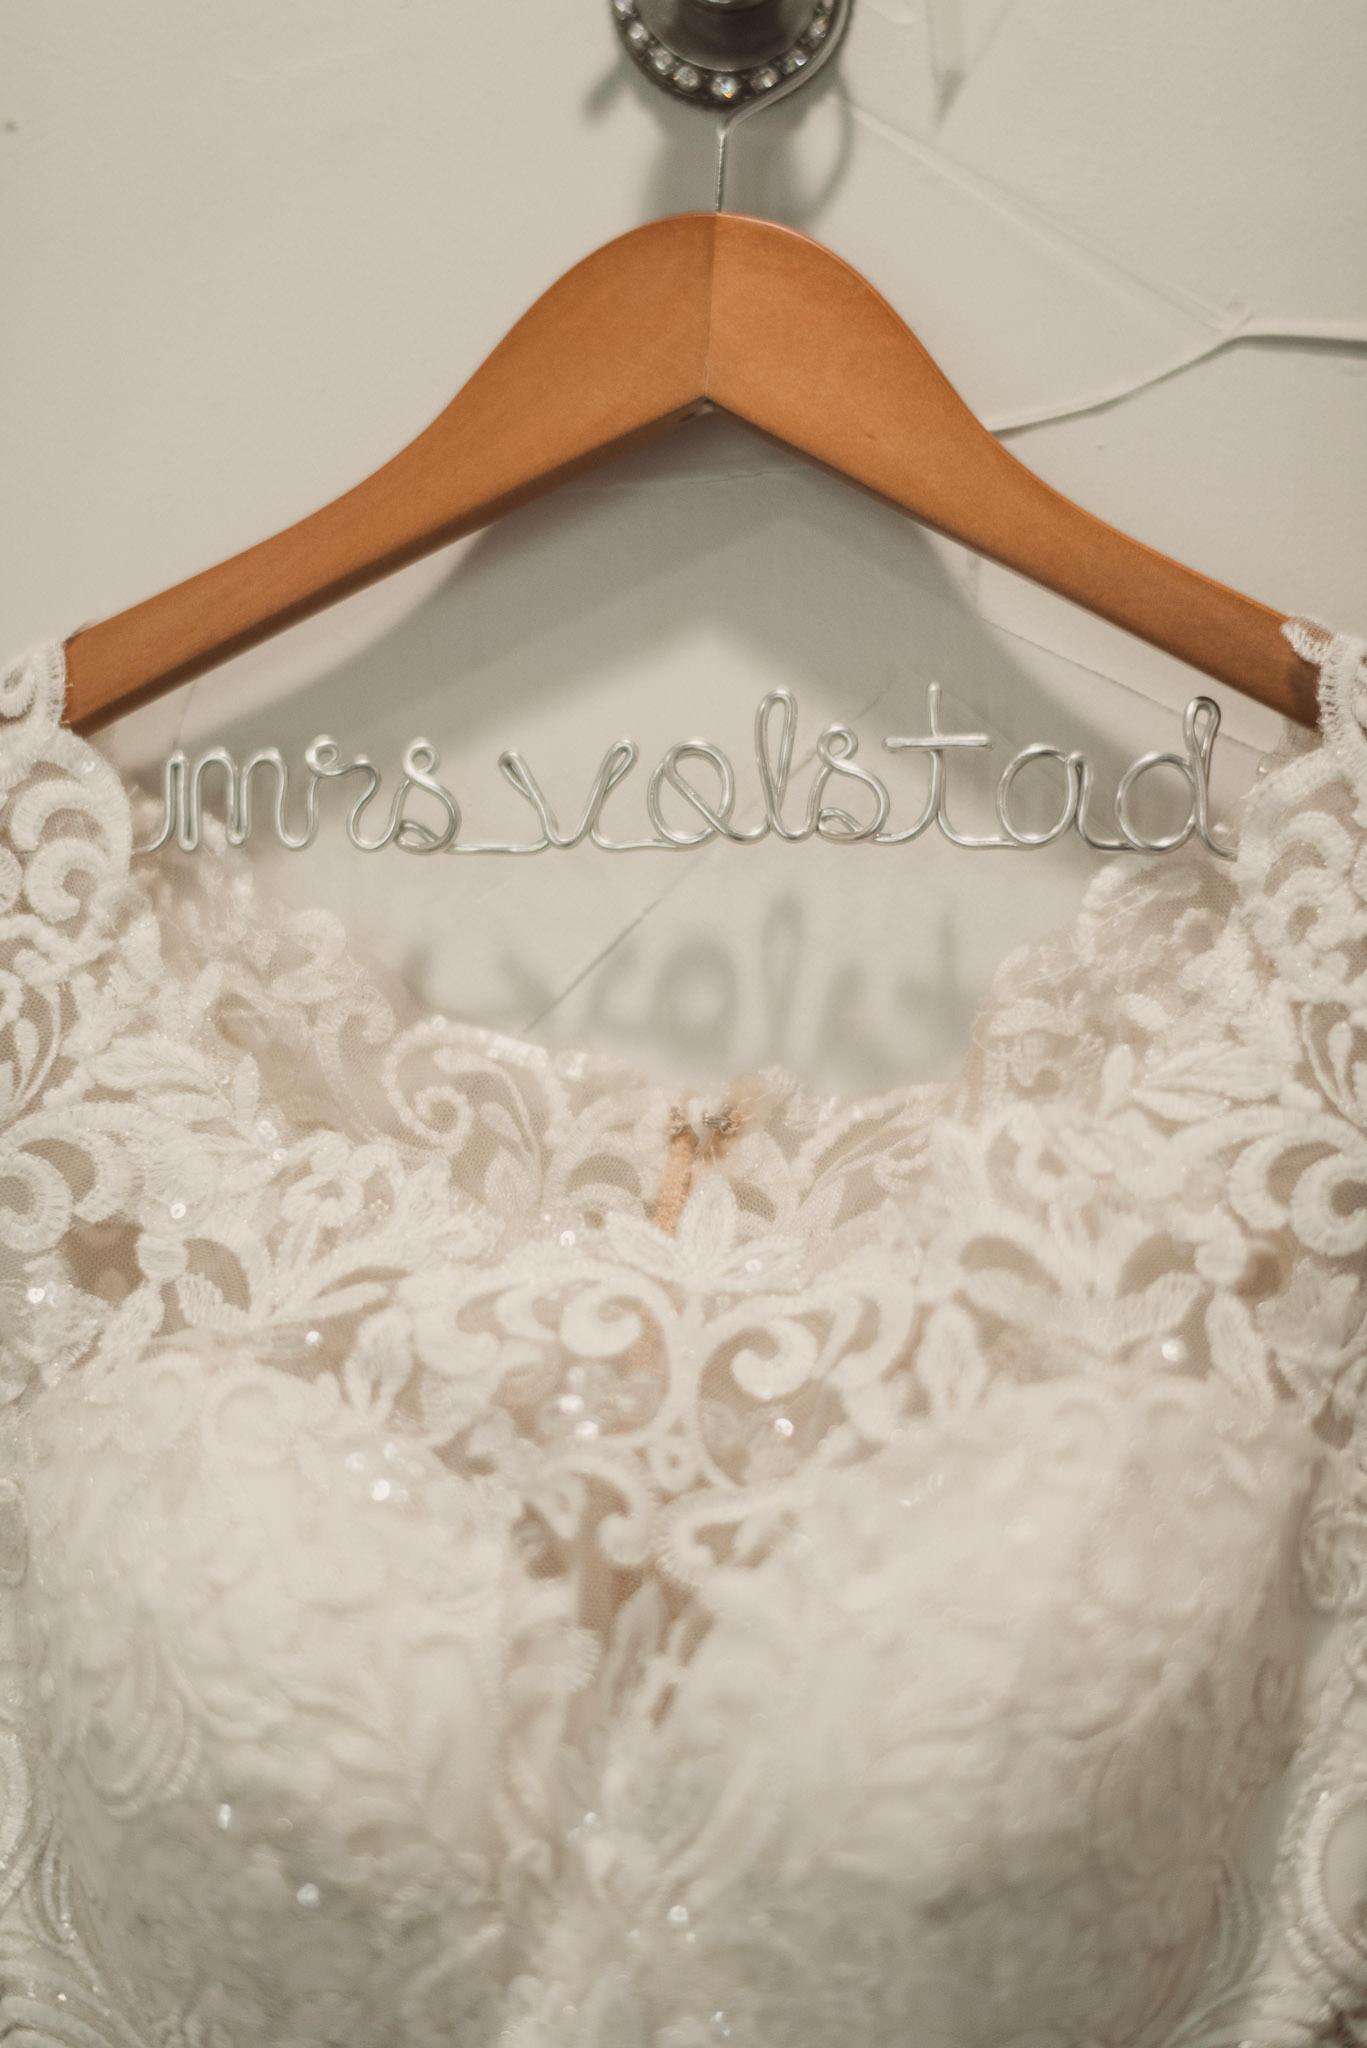 nichole-kyle-magnolia-bells-magnolia-wedding-sm-50.jpg